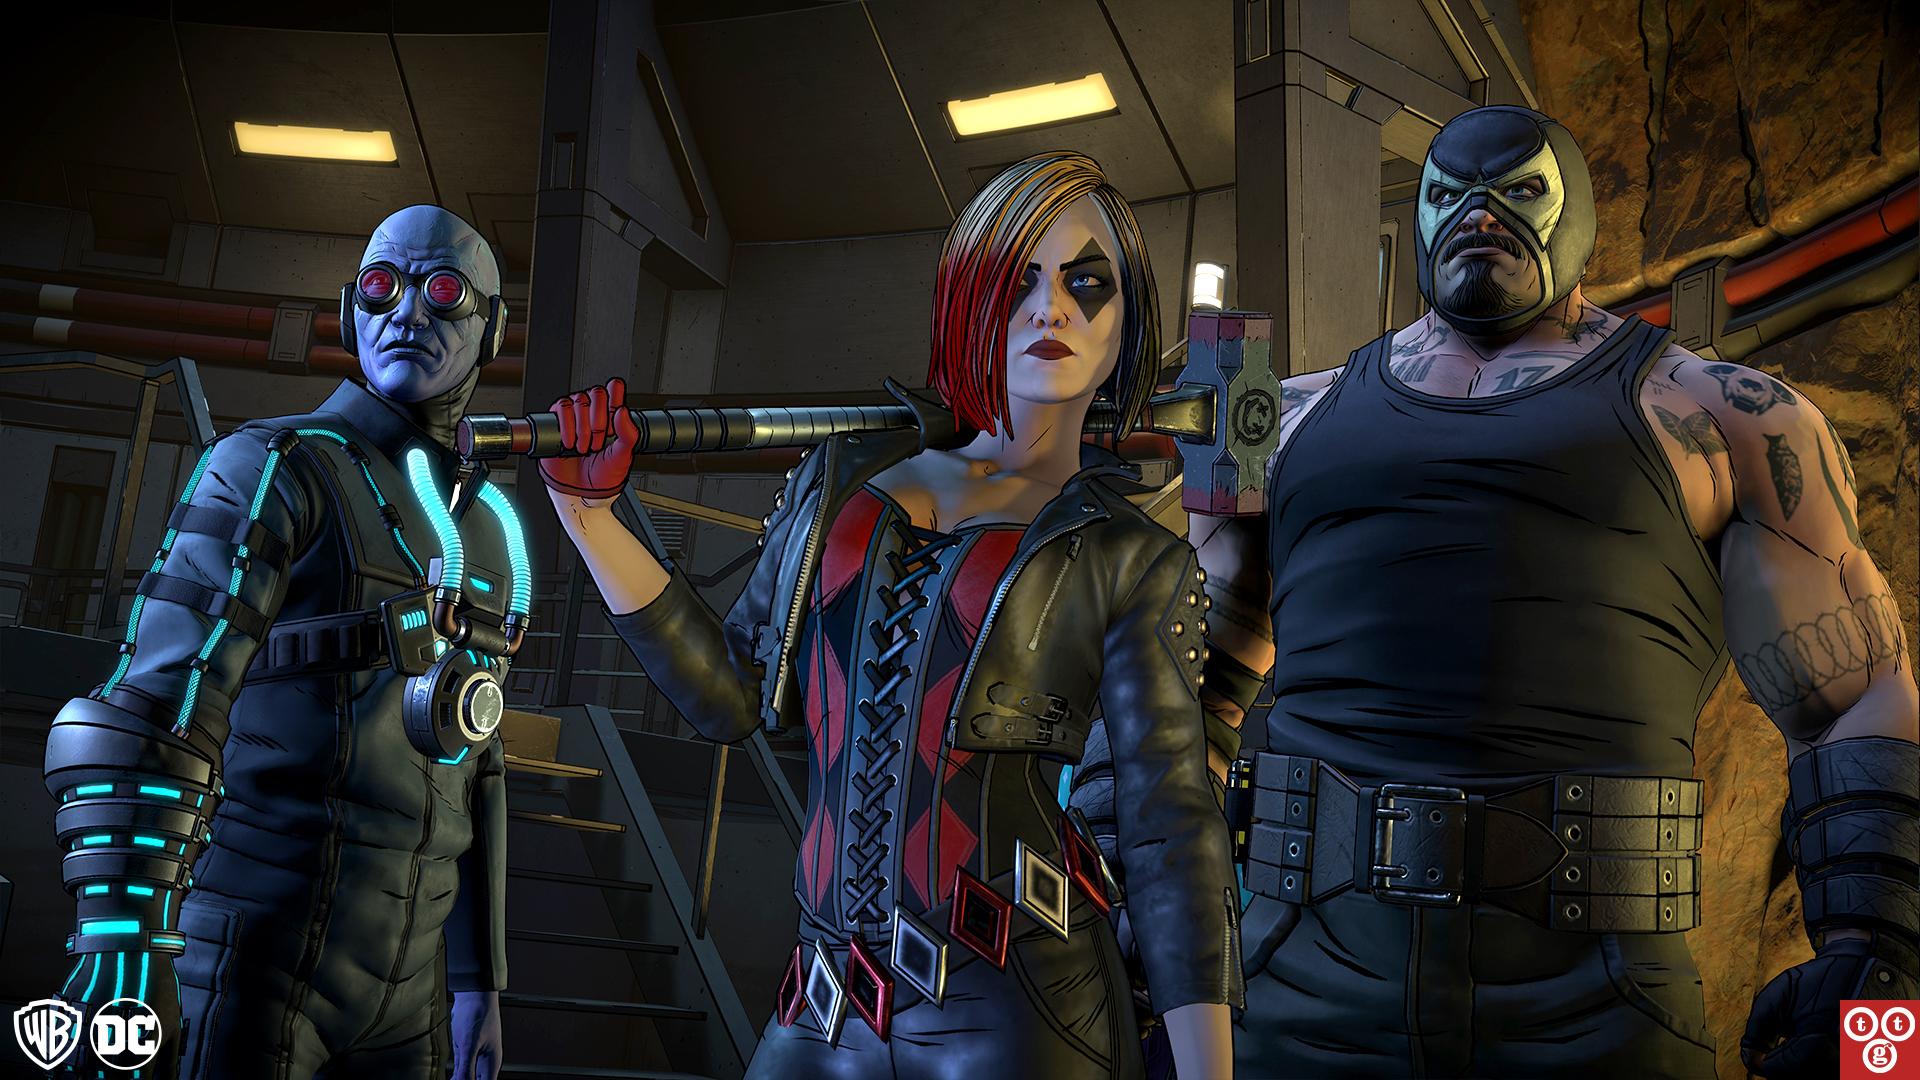 Mr. Freeze, Harley Quinn and Bane